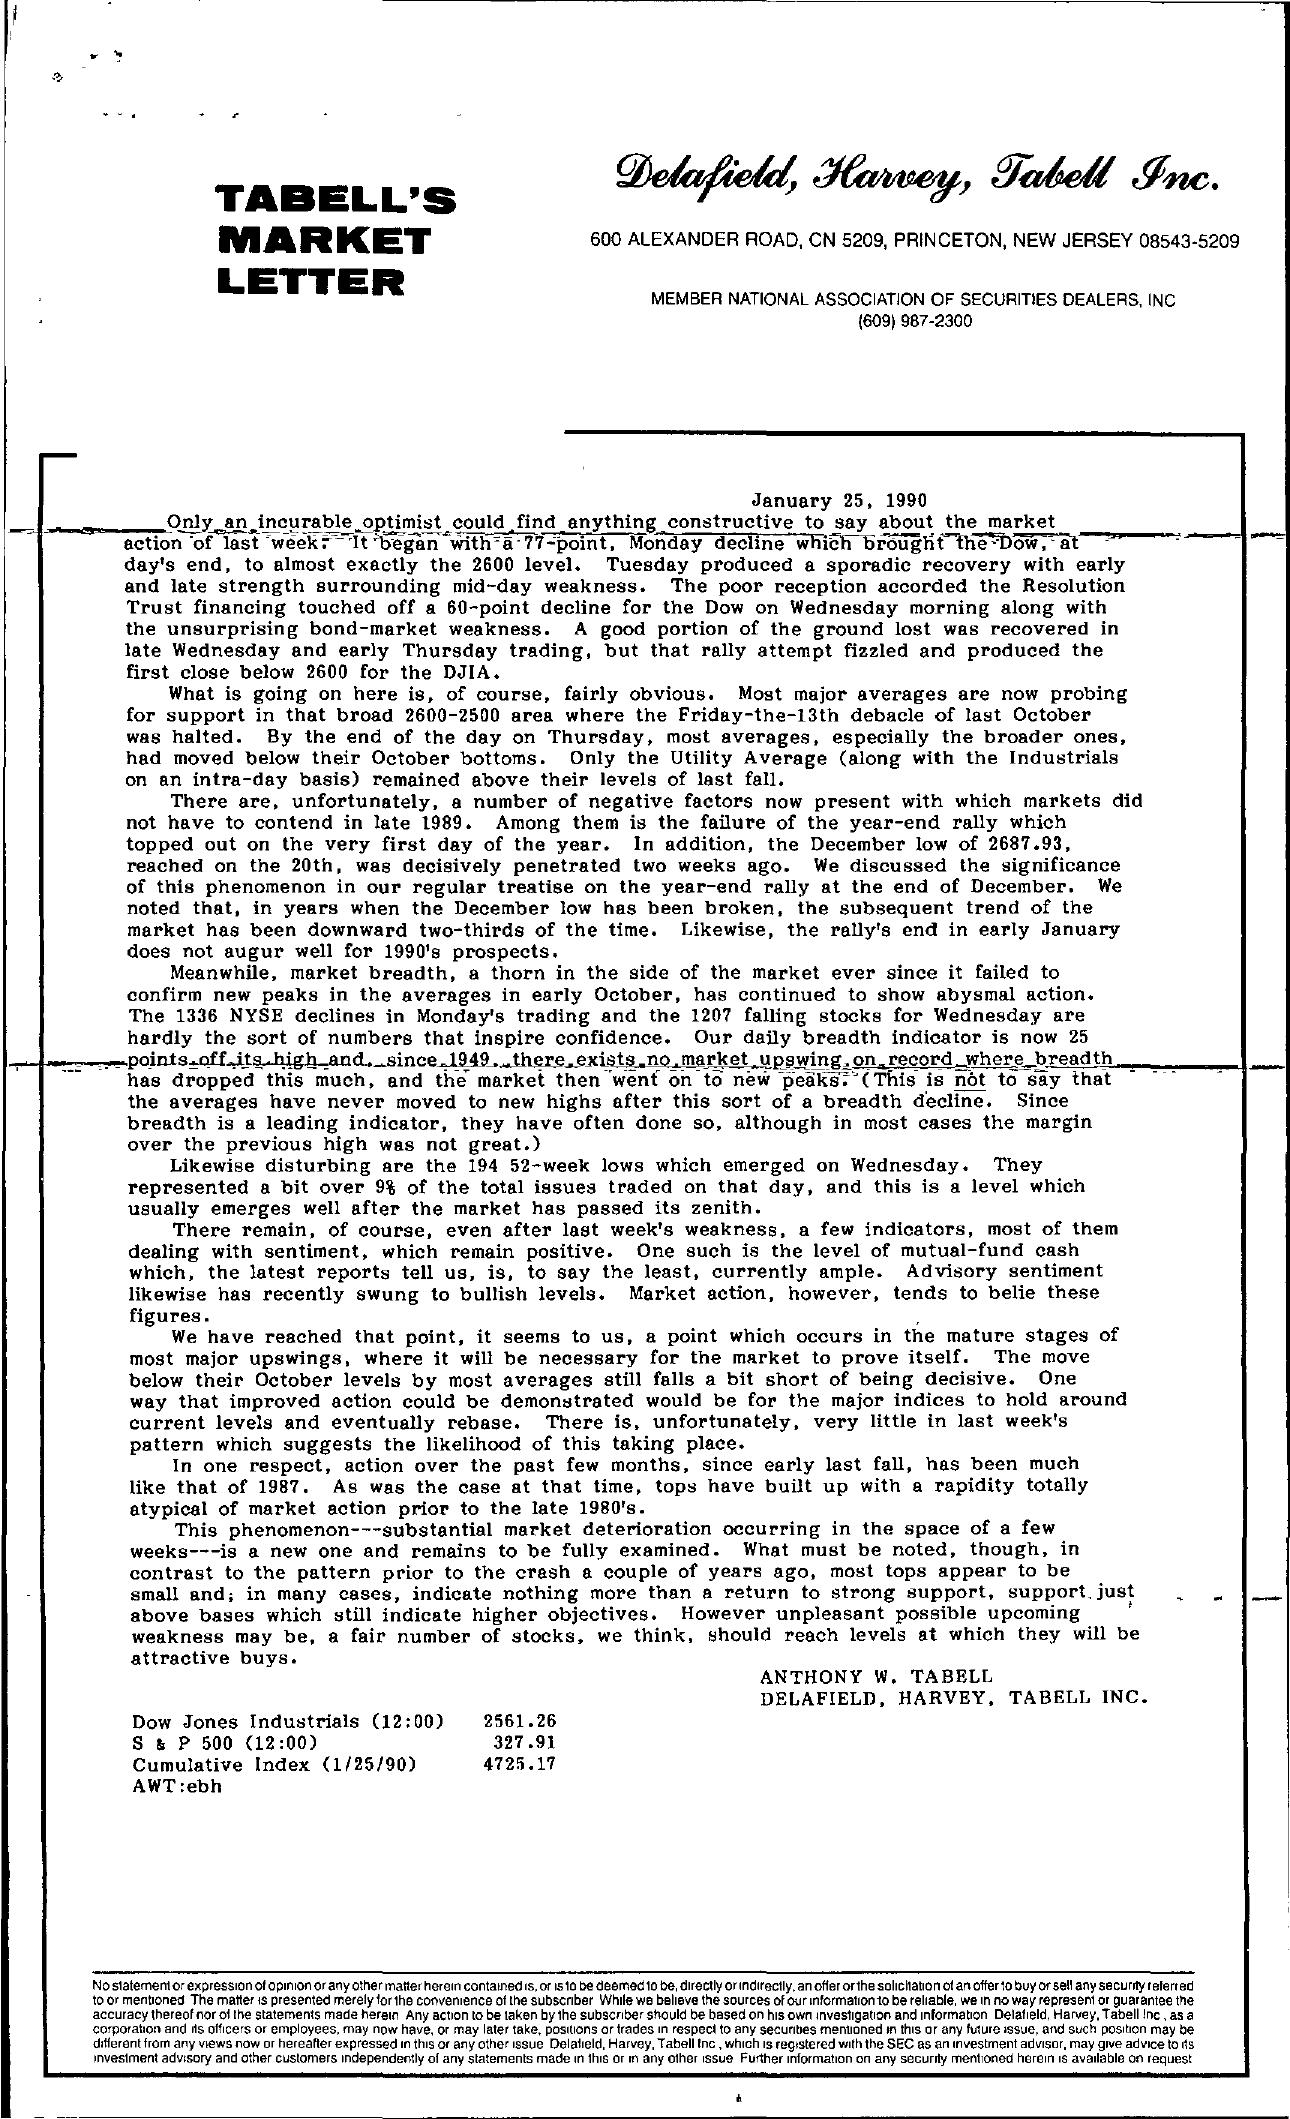 Tabell's Market Letter - January 25, 1990